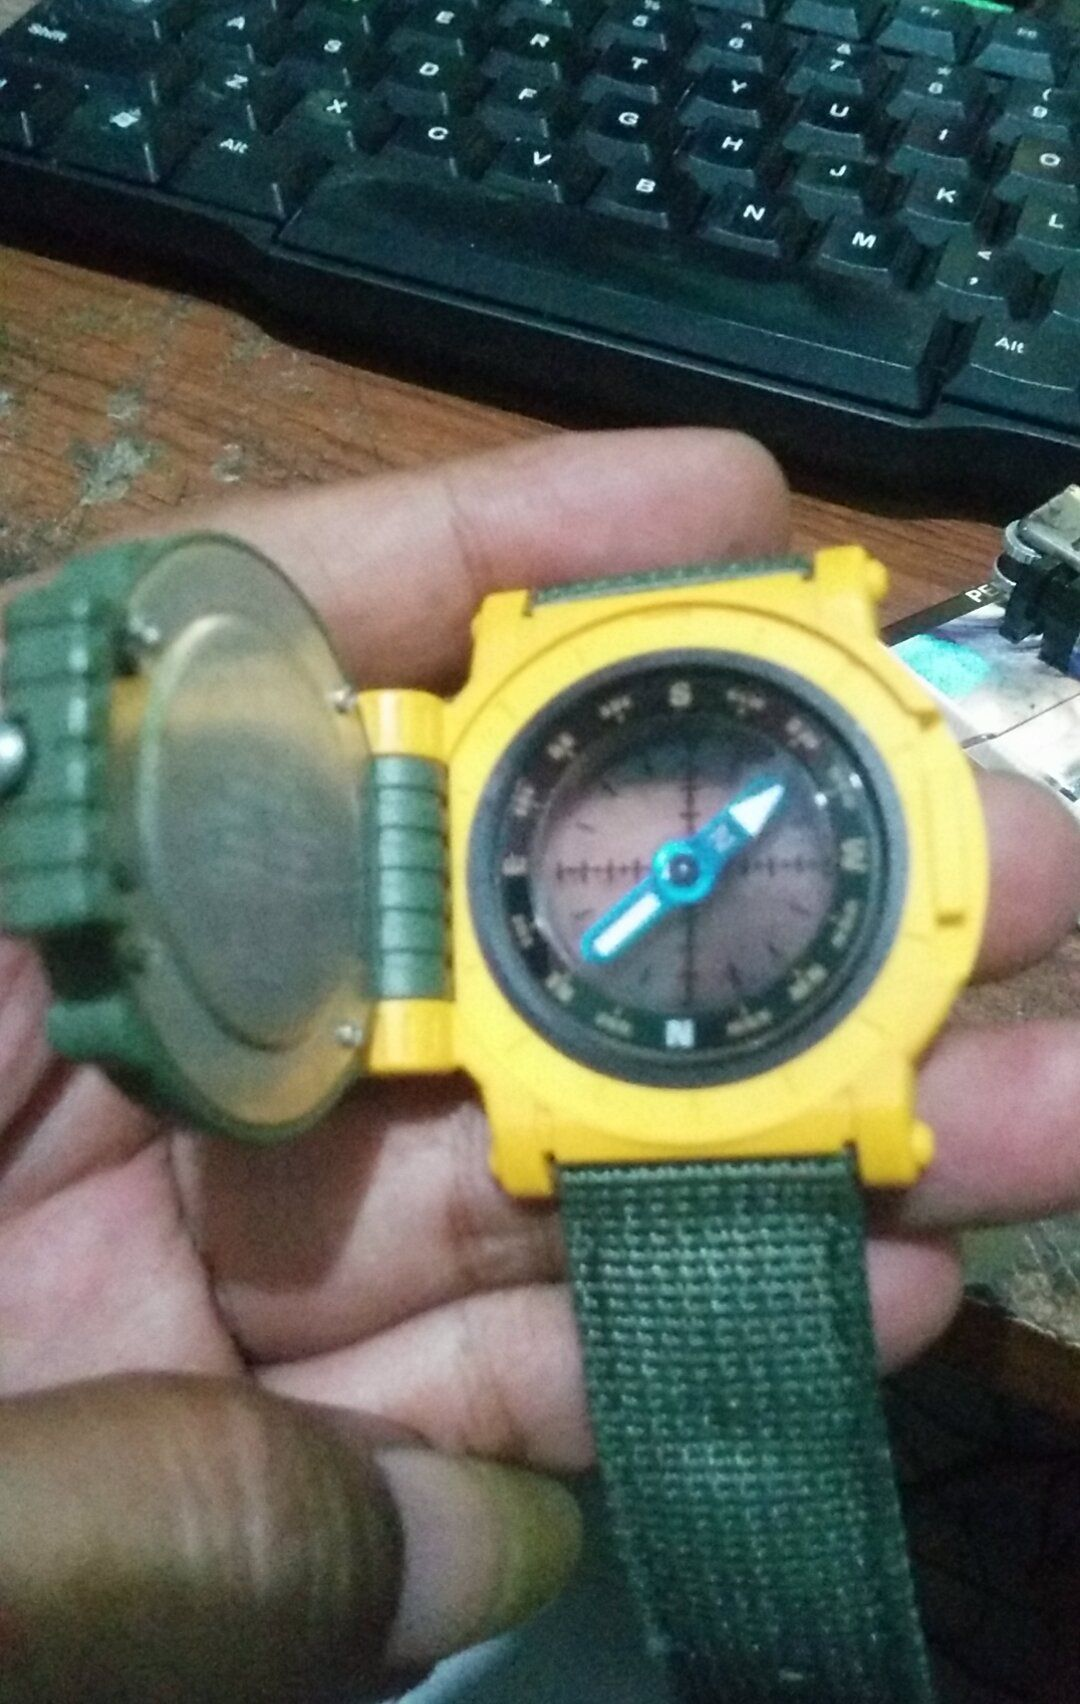 a79f5a0f05d Casio MW 43  Casio  Jam Tangan  Watch  Quartz  Jadul  Rare  Langka  Unik   Kompas  Compass